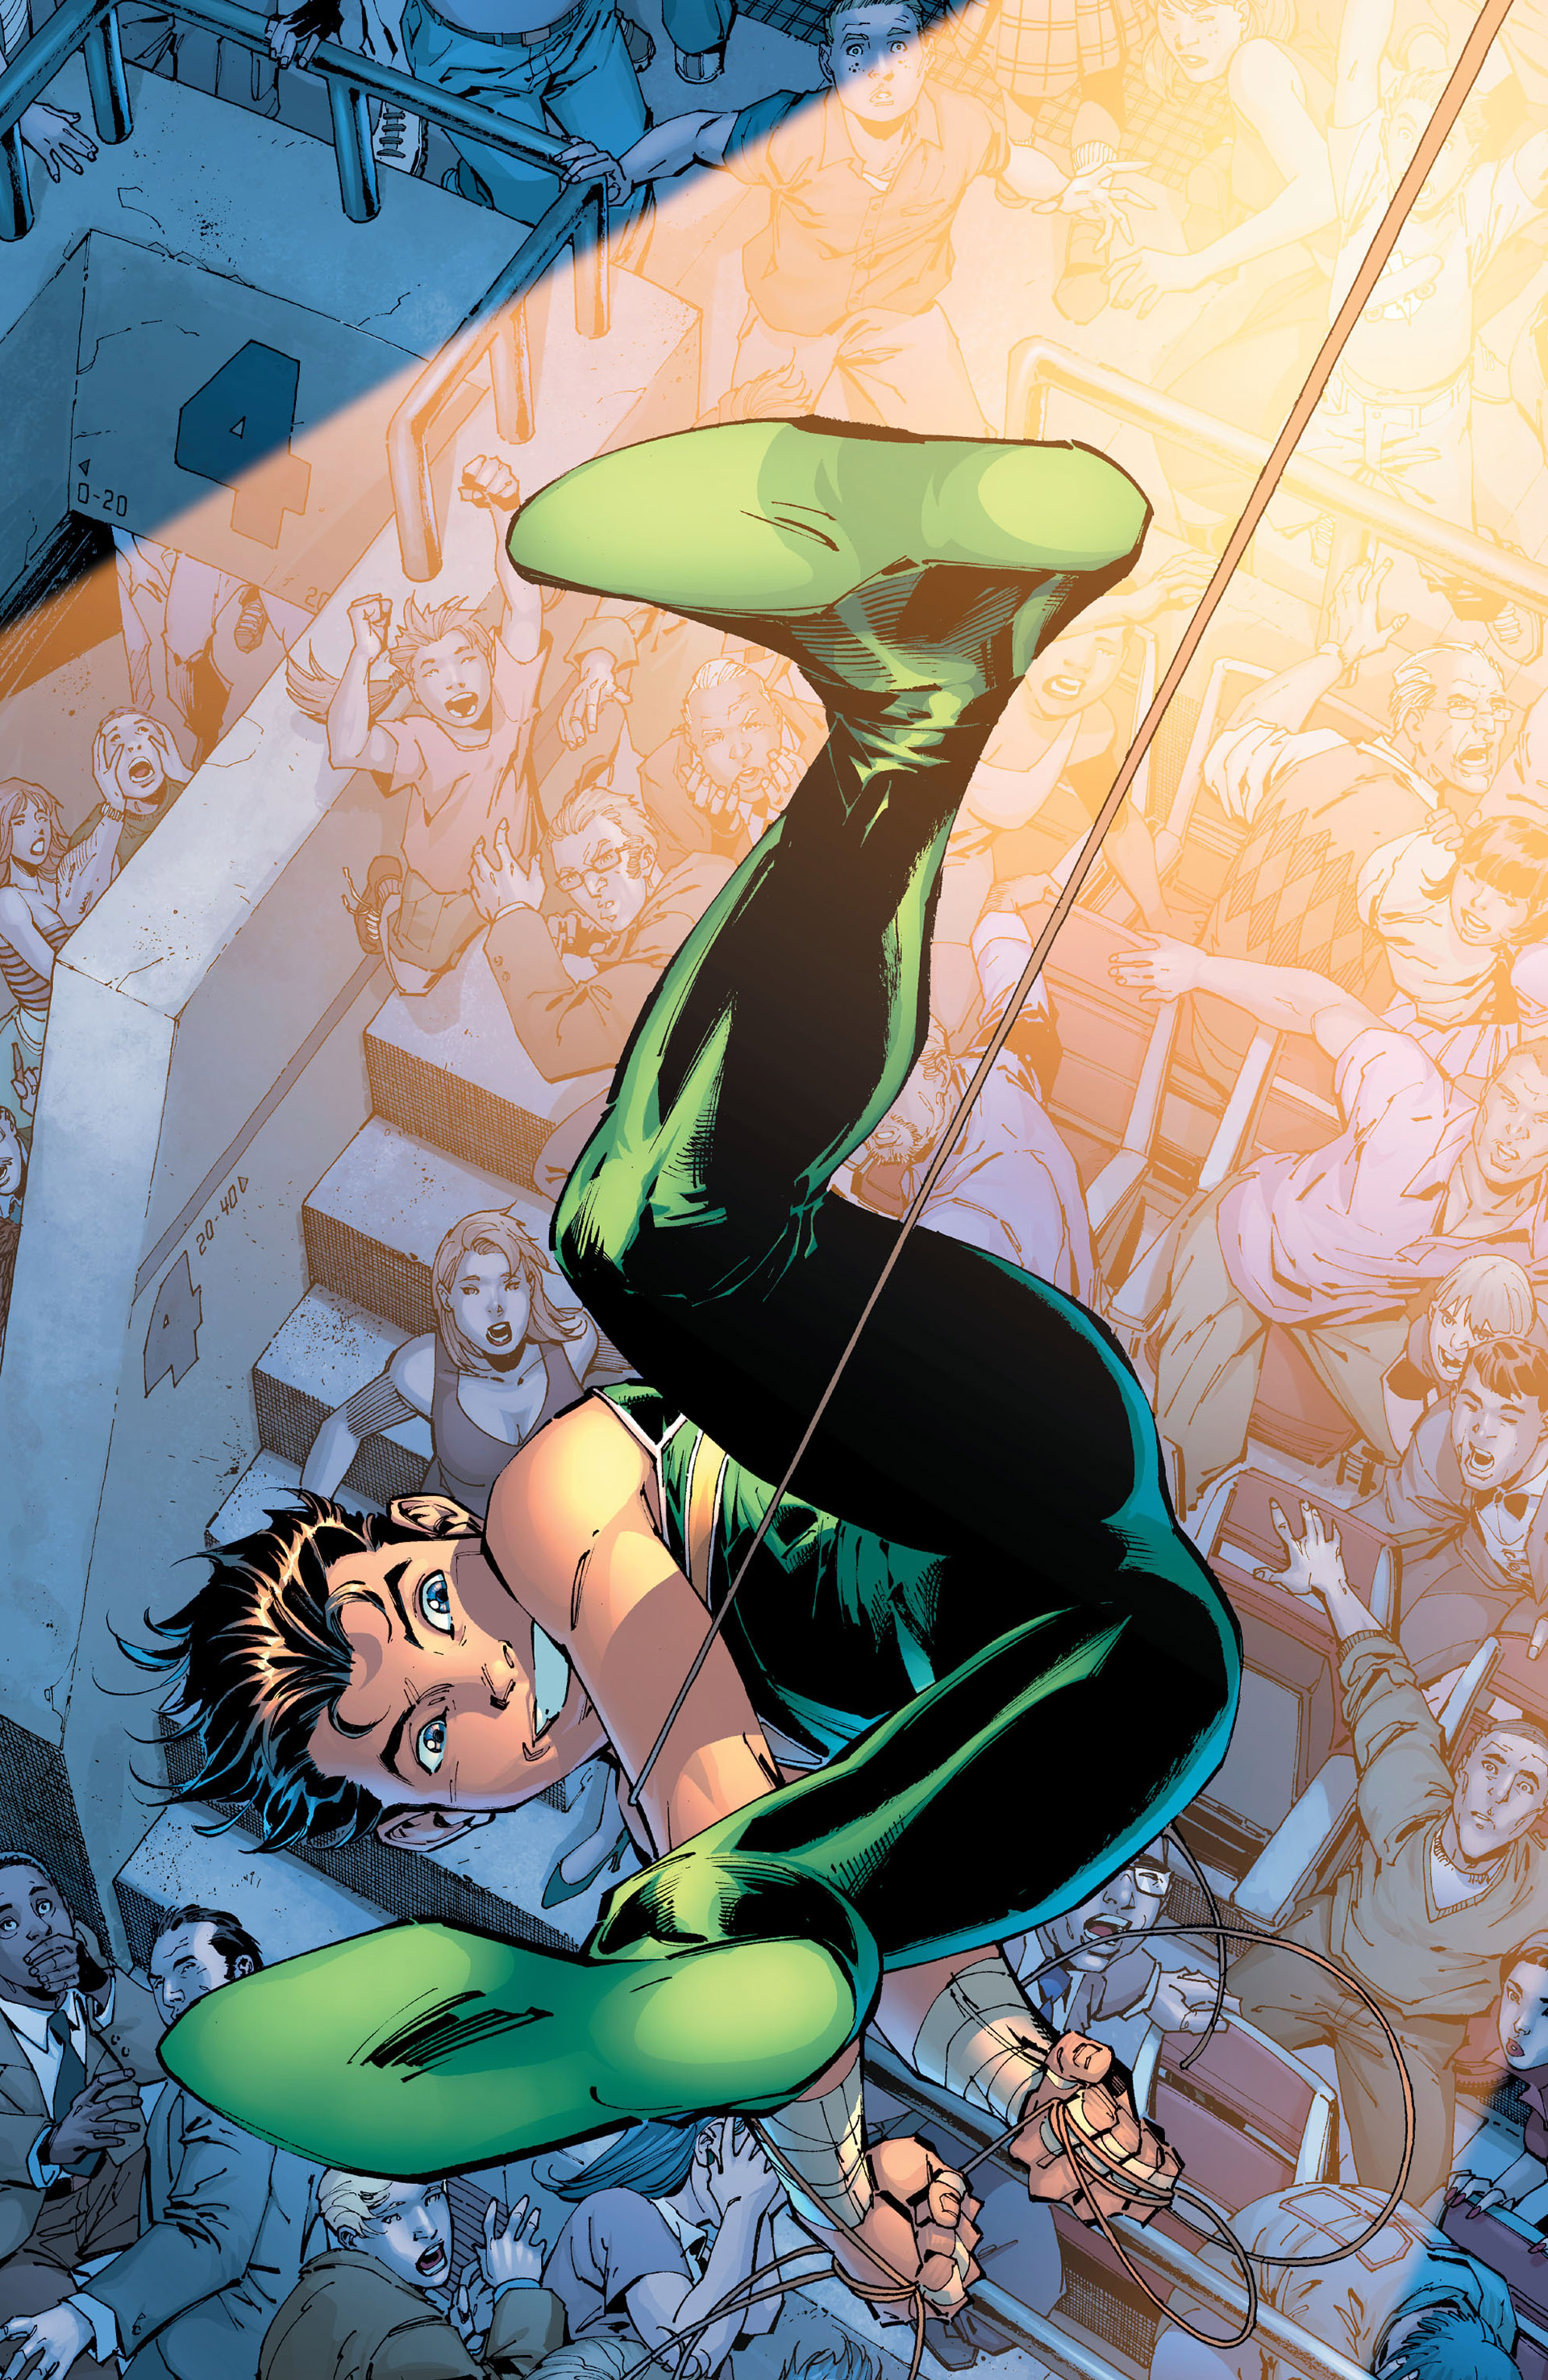 Read online All Star Batman & Robin, The Boy Wonder comic -  Issue #1 - 12